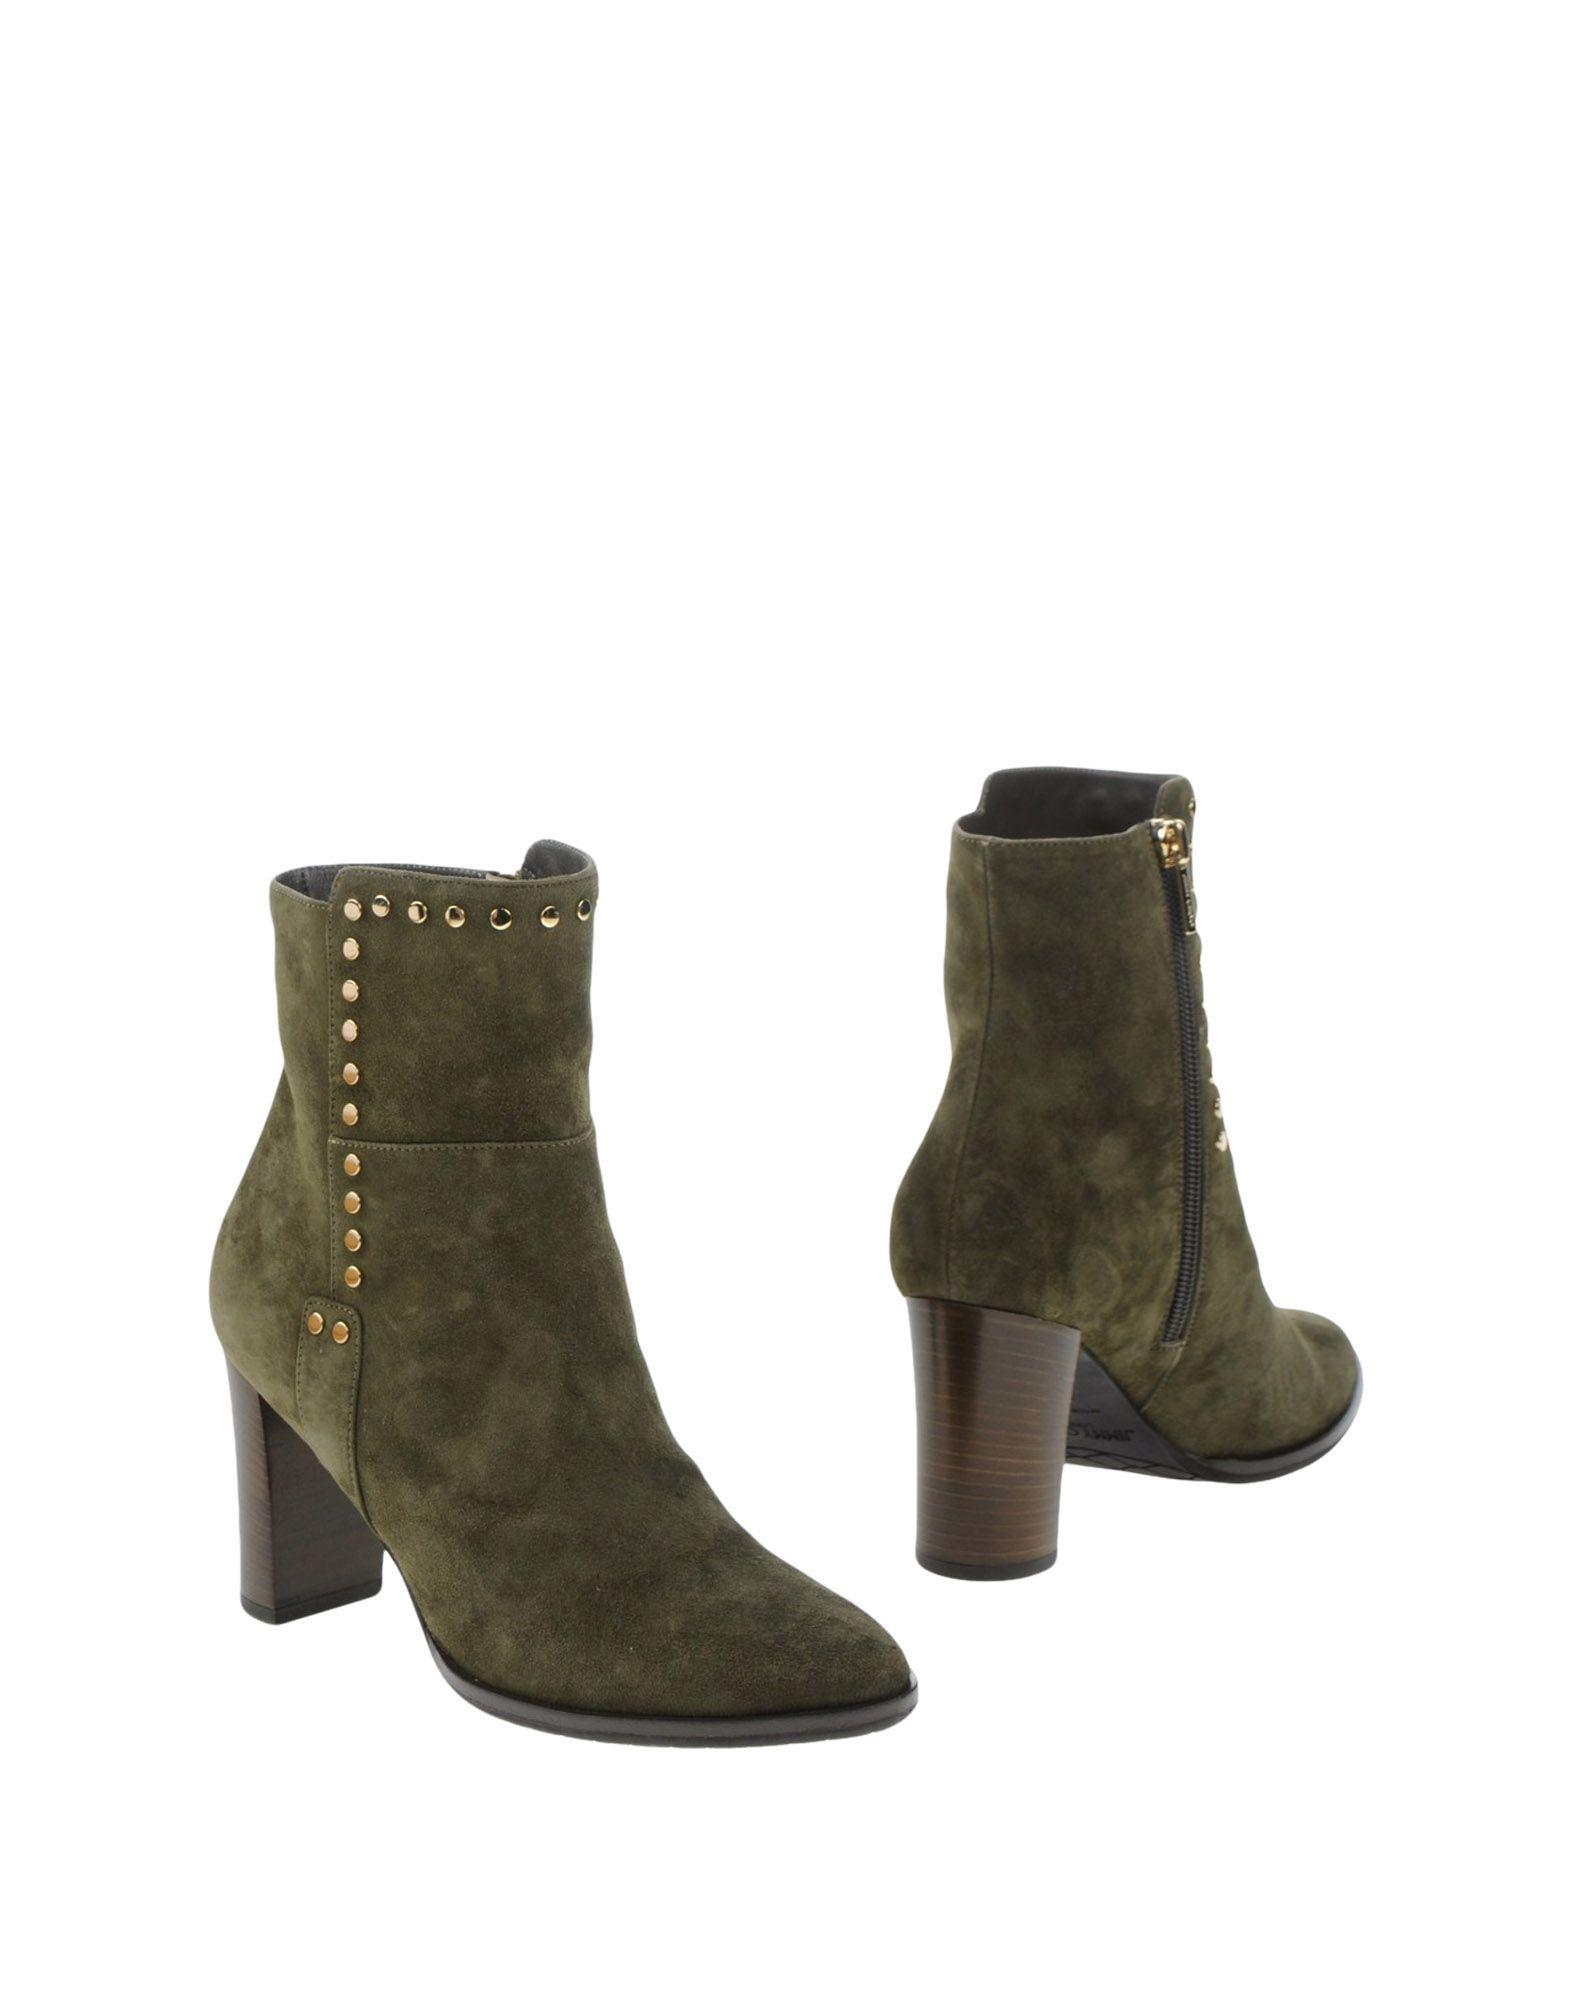 Jimmy Choo Stiefelette aussehende Damen  11214468LAGünstige gut aussehende Stiefelette Schuhe 924948